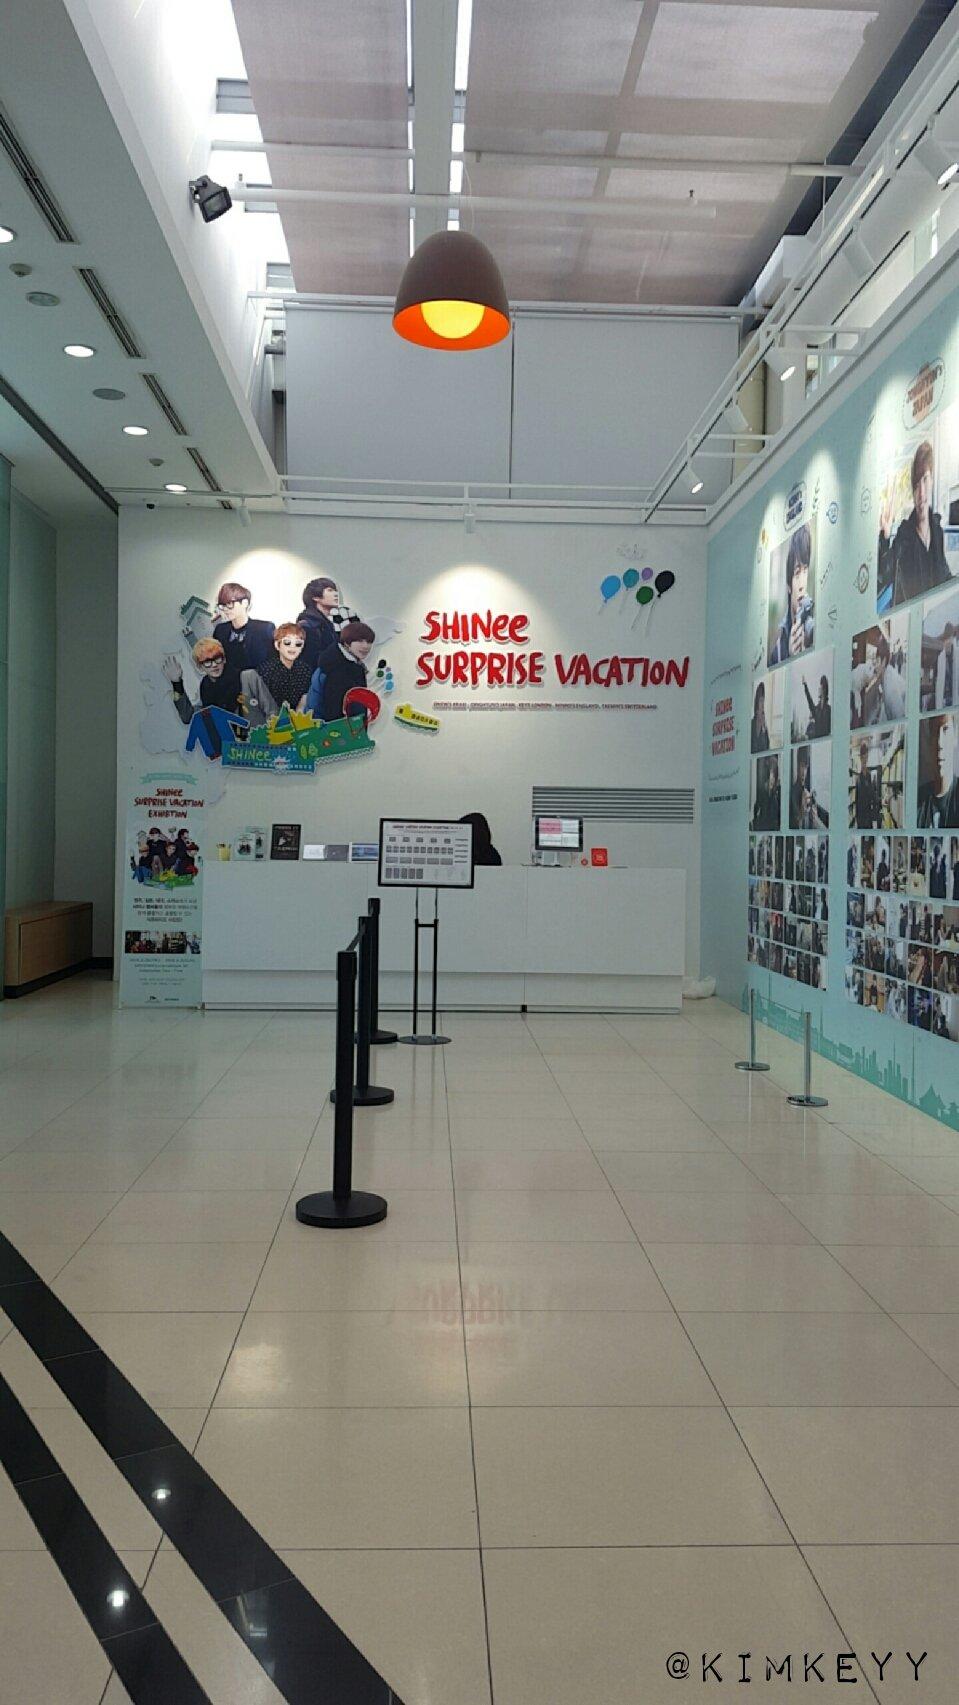 SHINee @ SHINee Surprise Vacation Exhibition 25217765871_84542233b7_o